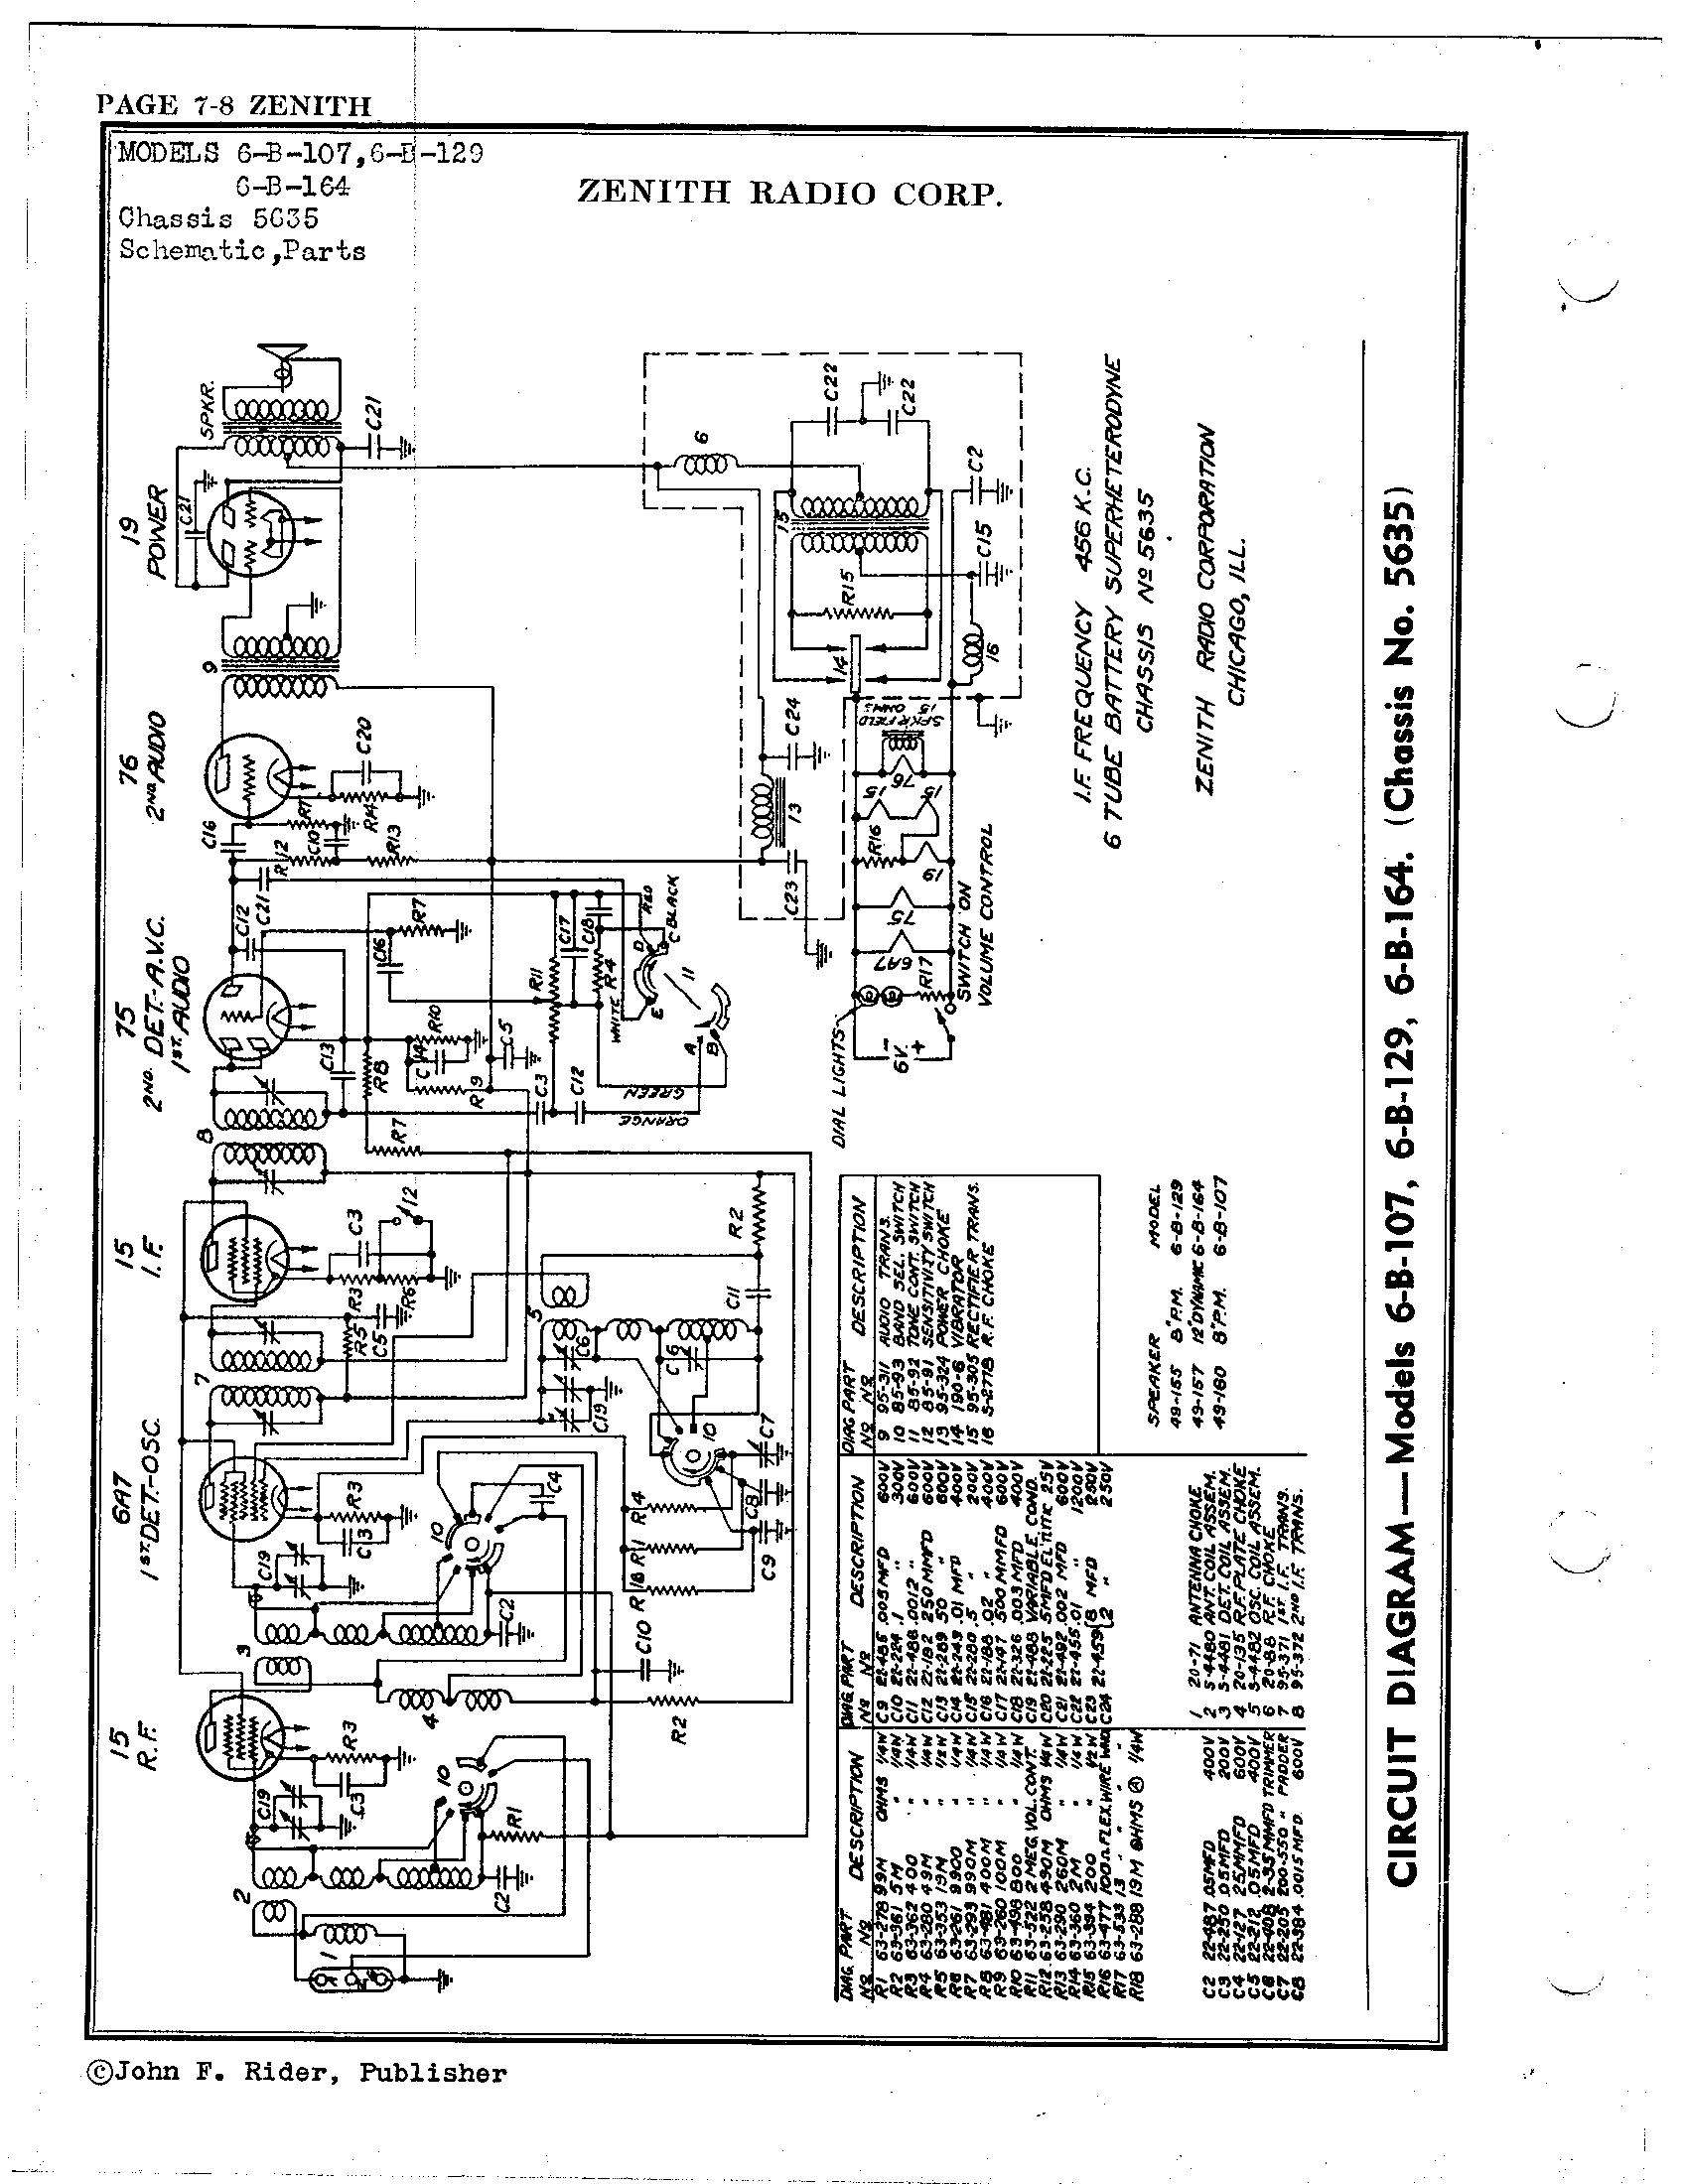 Zenith Radio Corp 6b164 Antique Electronic Supply. Page 1 7608 Kb Rider Manual Volume 7. Wiring. Zenith Tube Radio Schematics Model 6s At Scoala.co